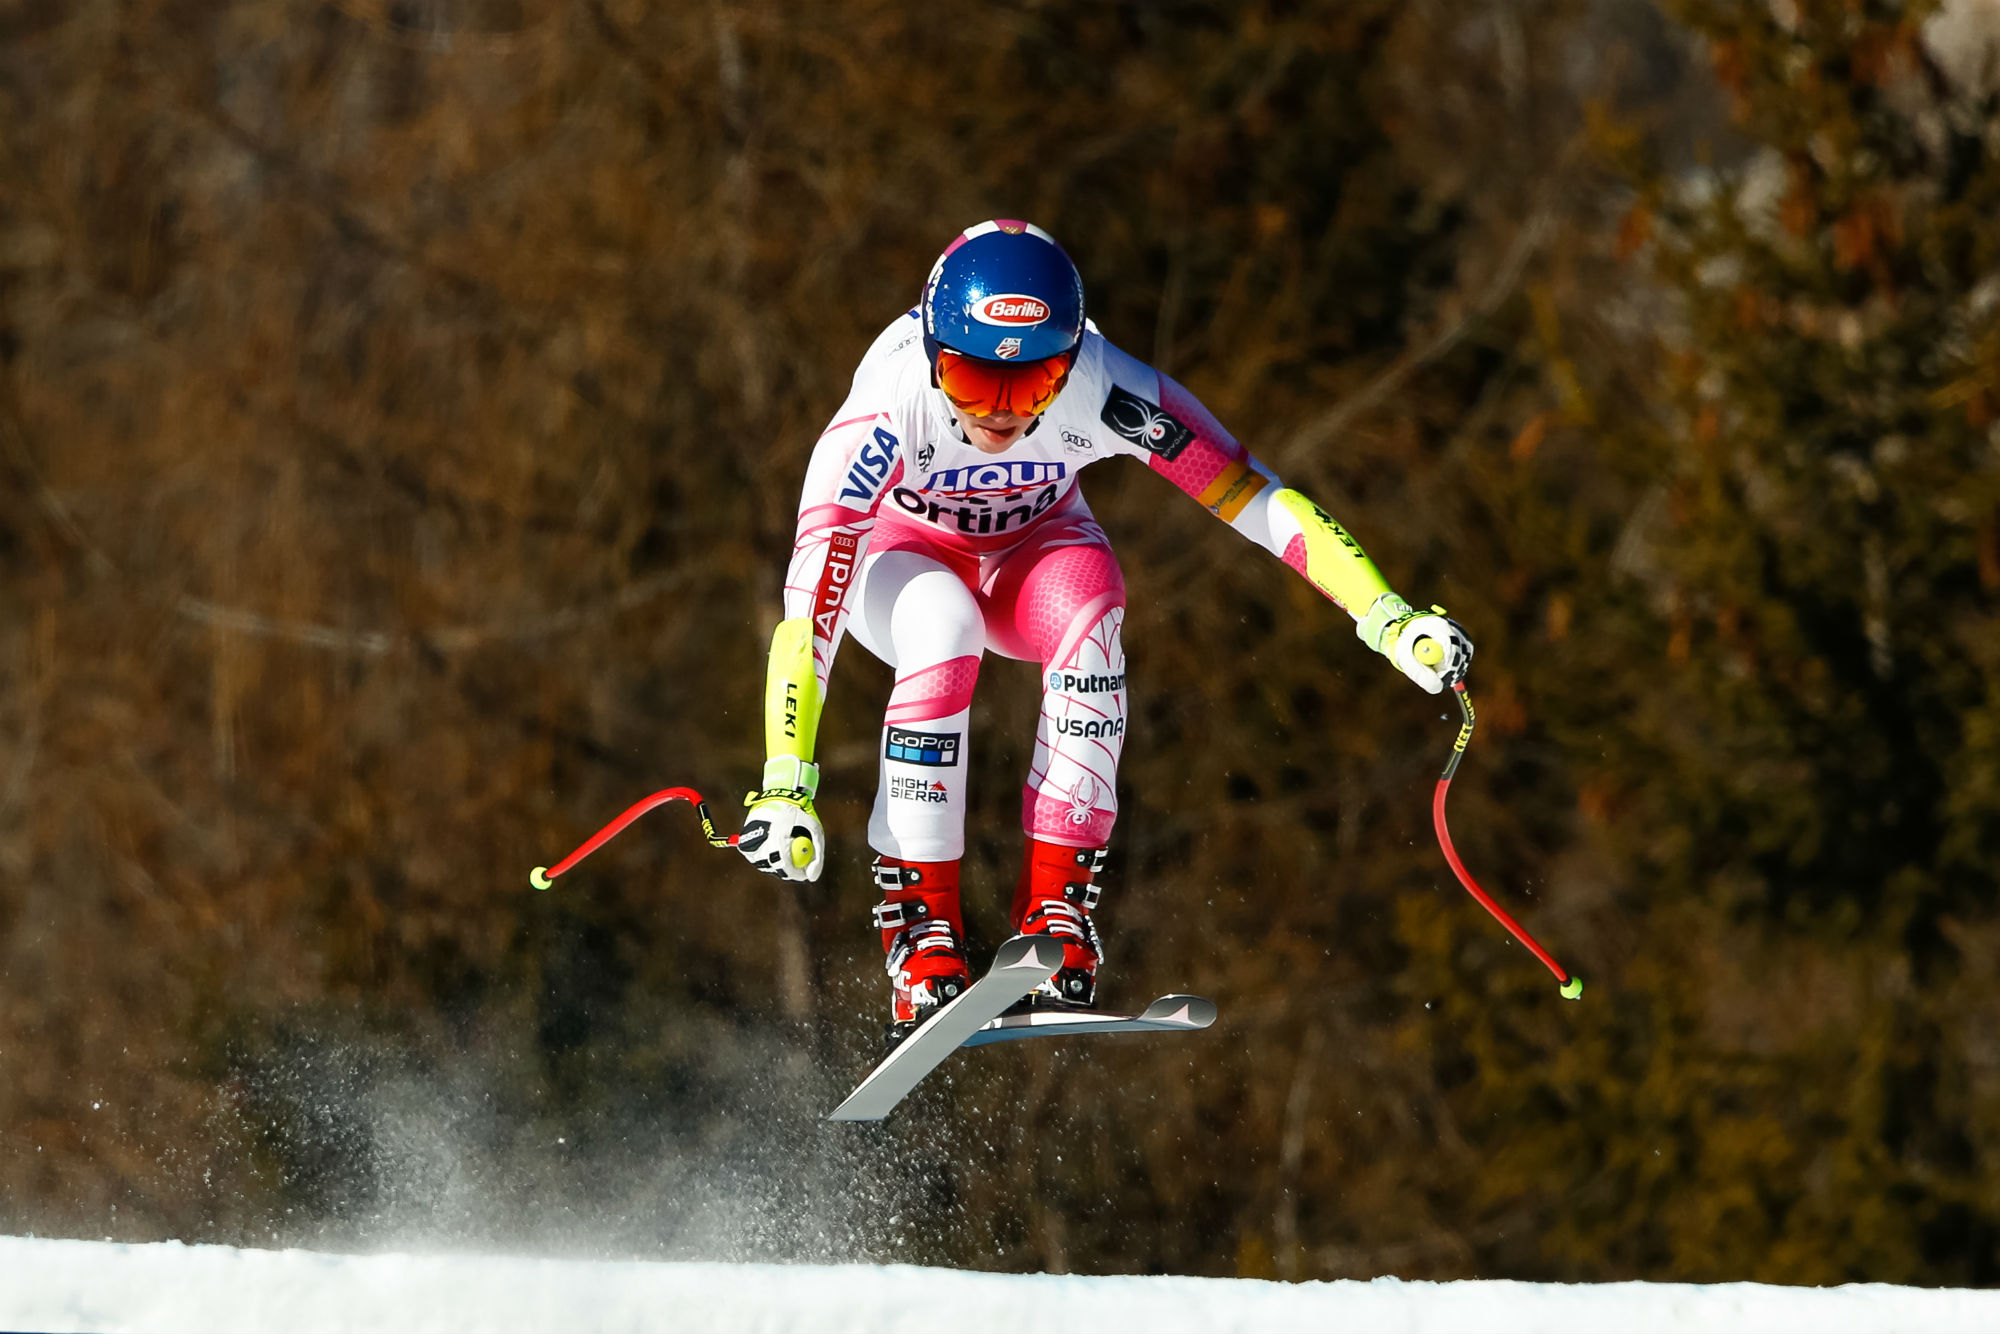 Mikaela Shiffrin a Cortina (@Zoom agence)